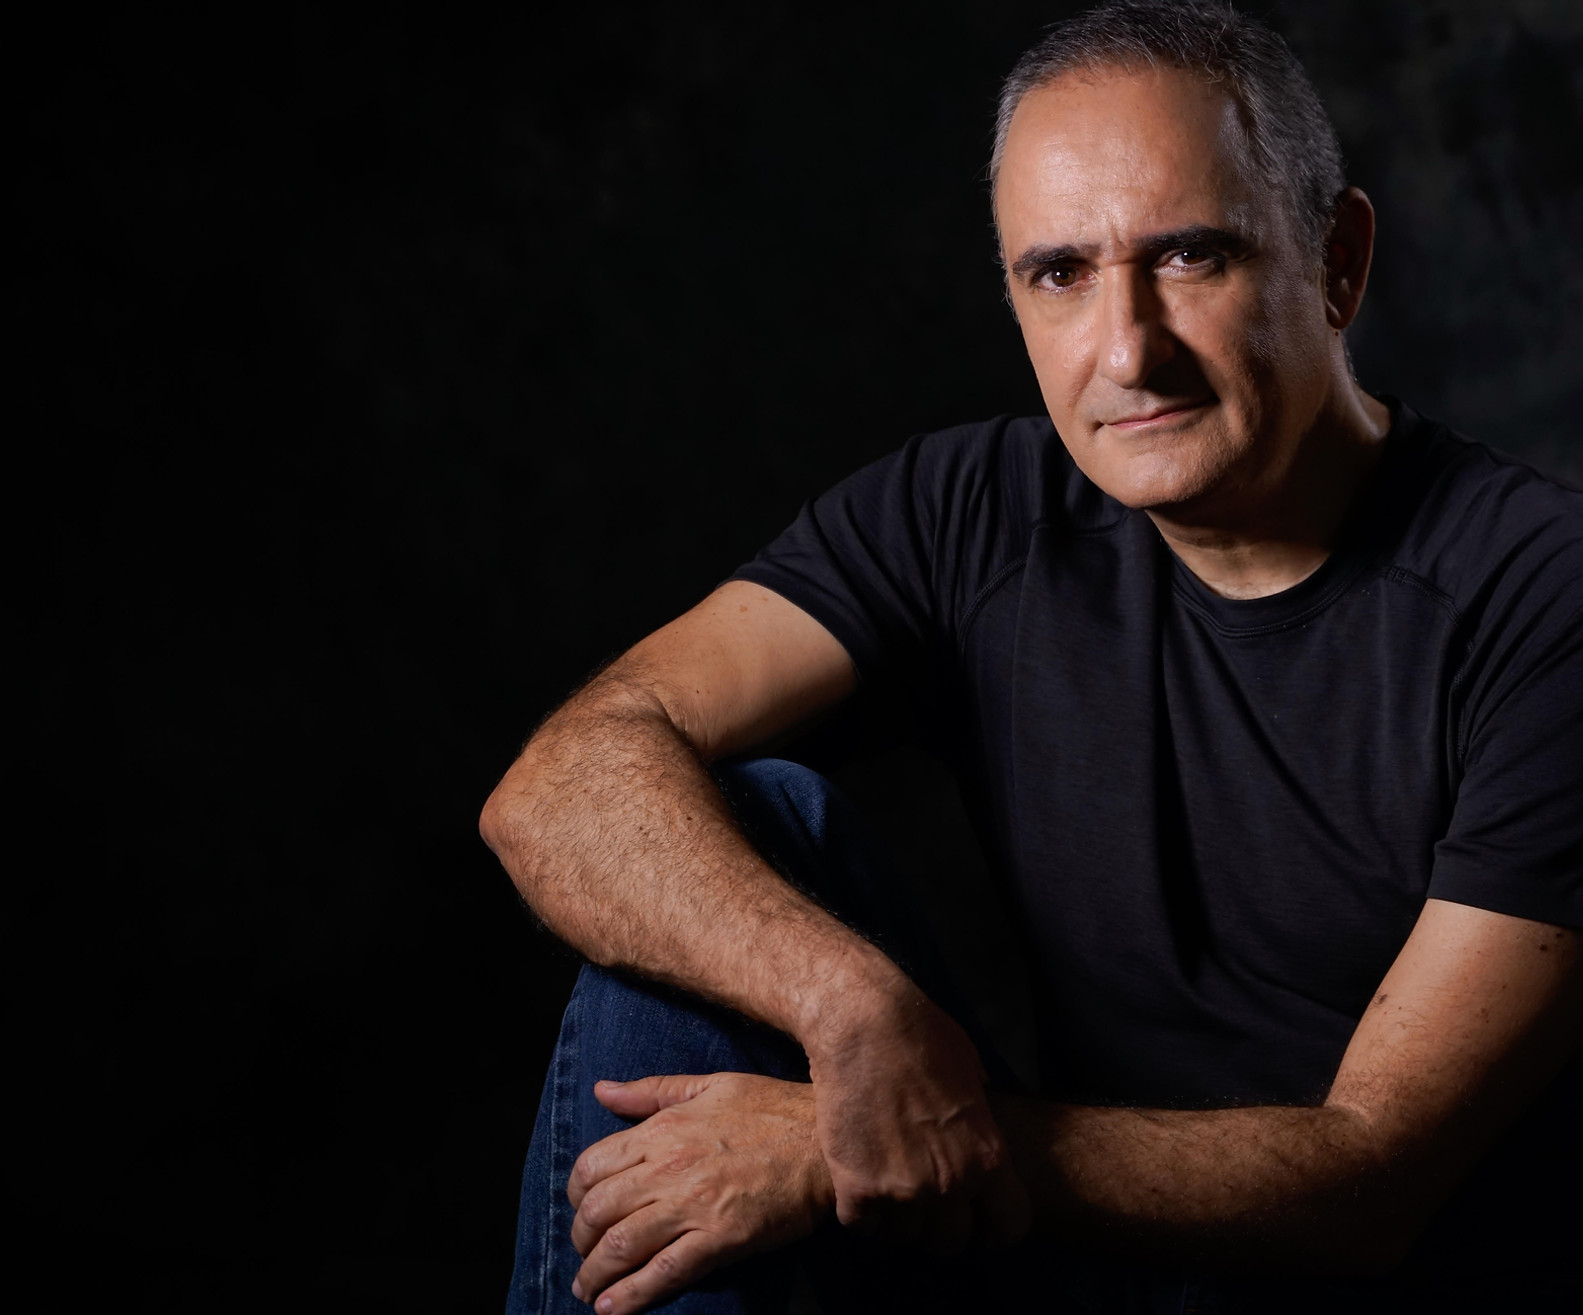 Alexander Martin Kouri, político peruano, chim pum callao, andra llona de kouri